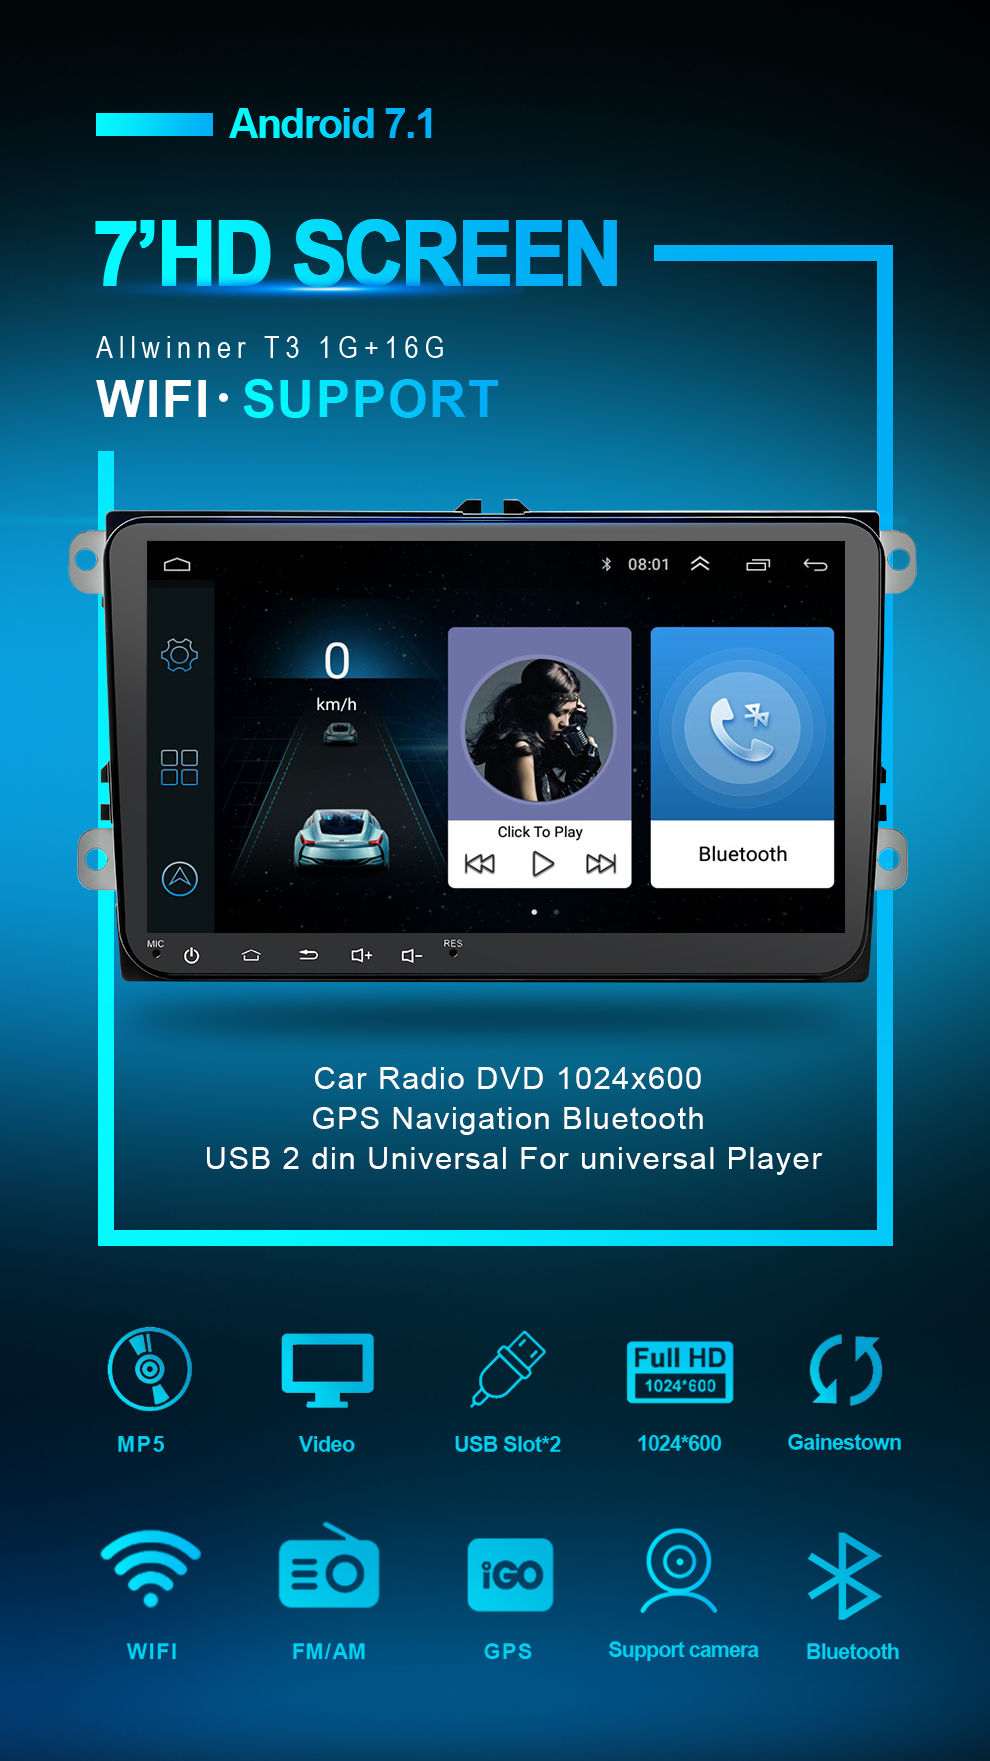 Car DVD GPS android 7.1 Player 2din radio universal Wifi GPS Navigation Audio For Skoda Octavia Fabia Rapid Yeti Superb VW Seat (21)